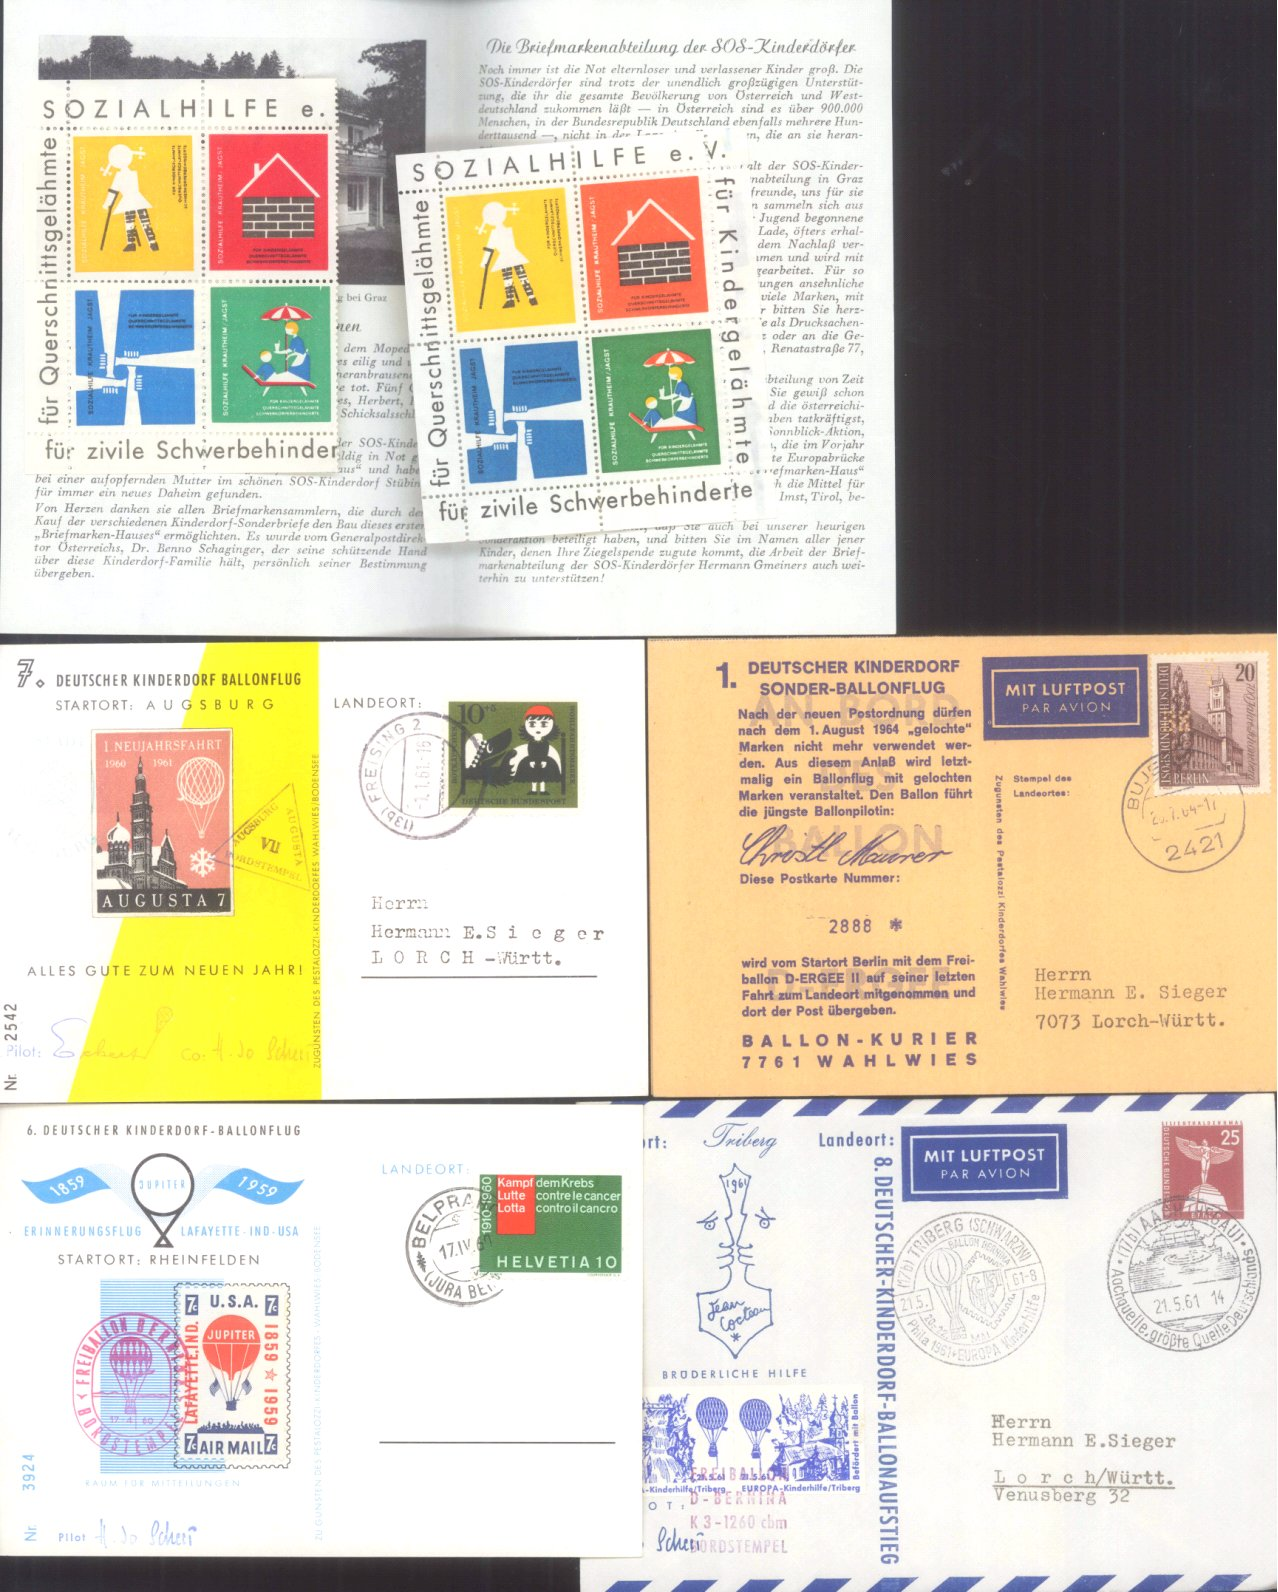 MOTIV BALLONPOST / KINDERDORF BALLONPOST 1952-1972-1